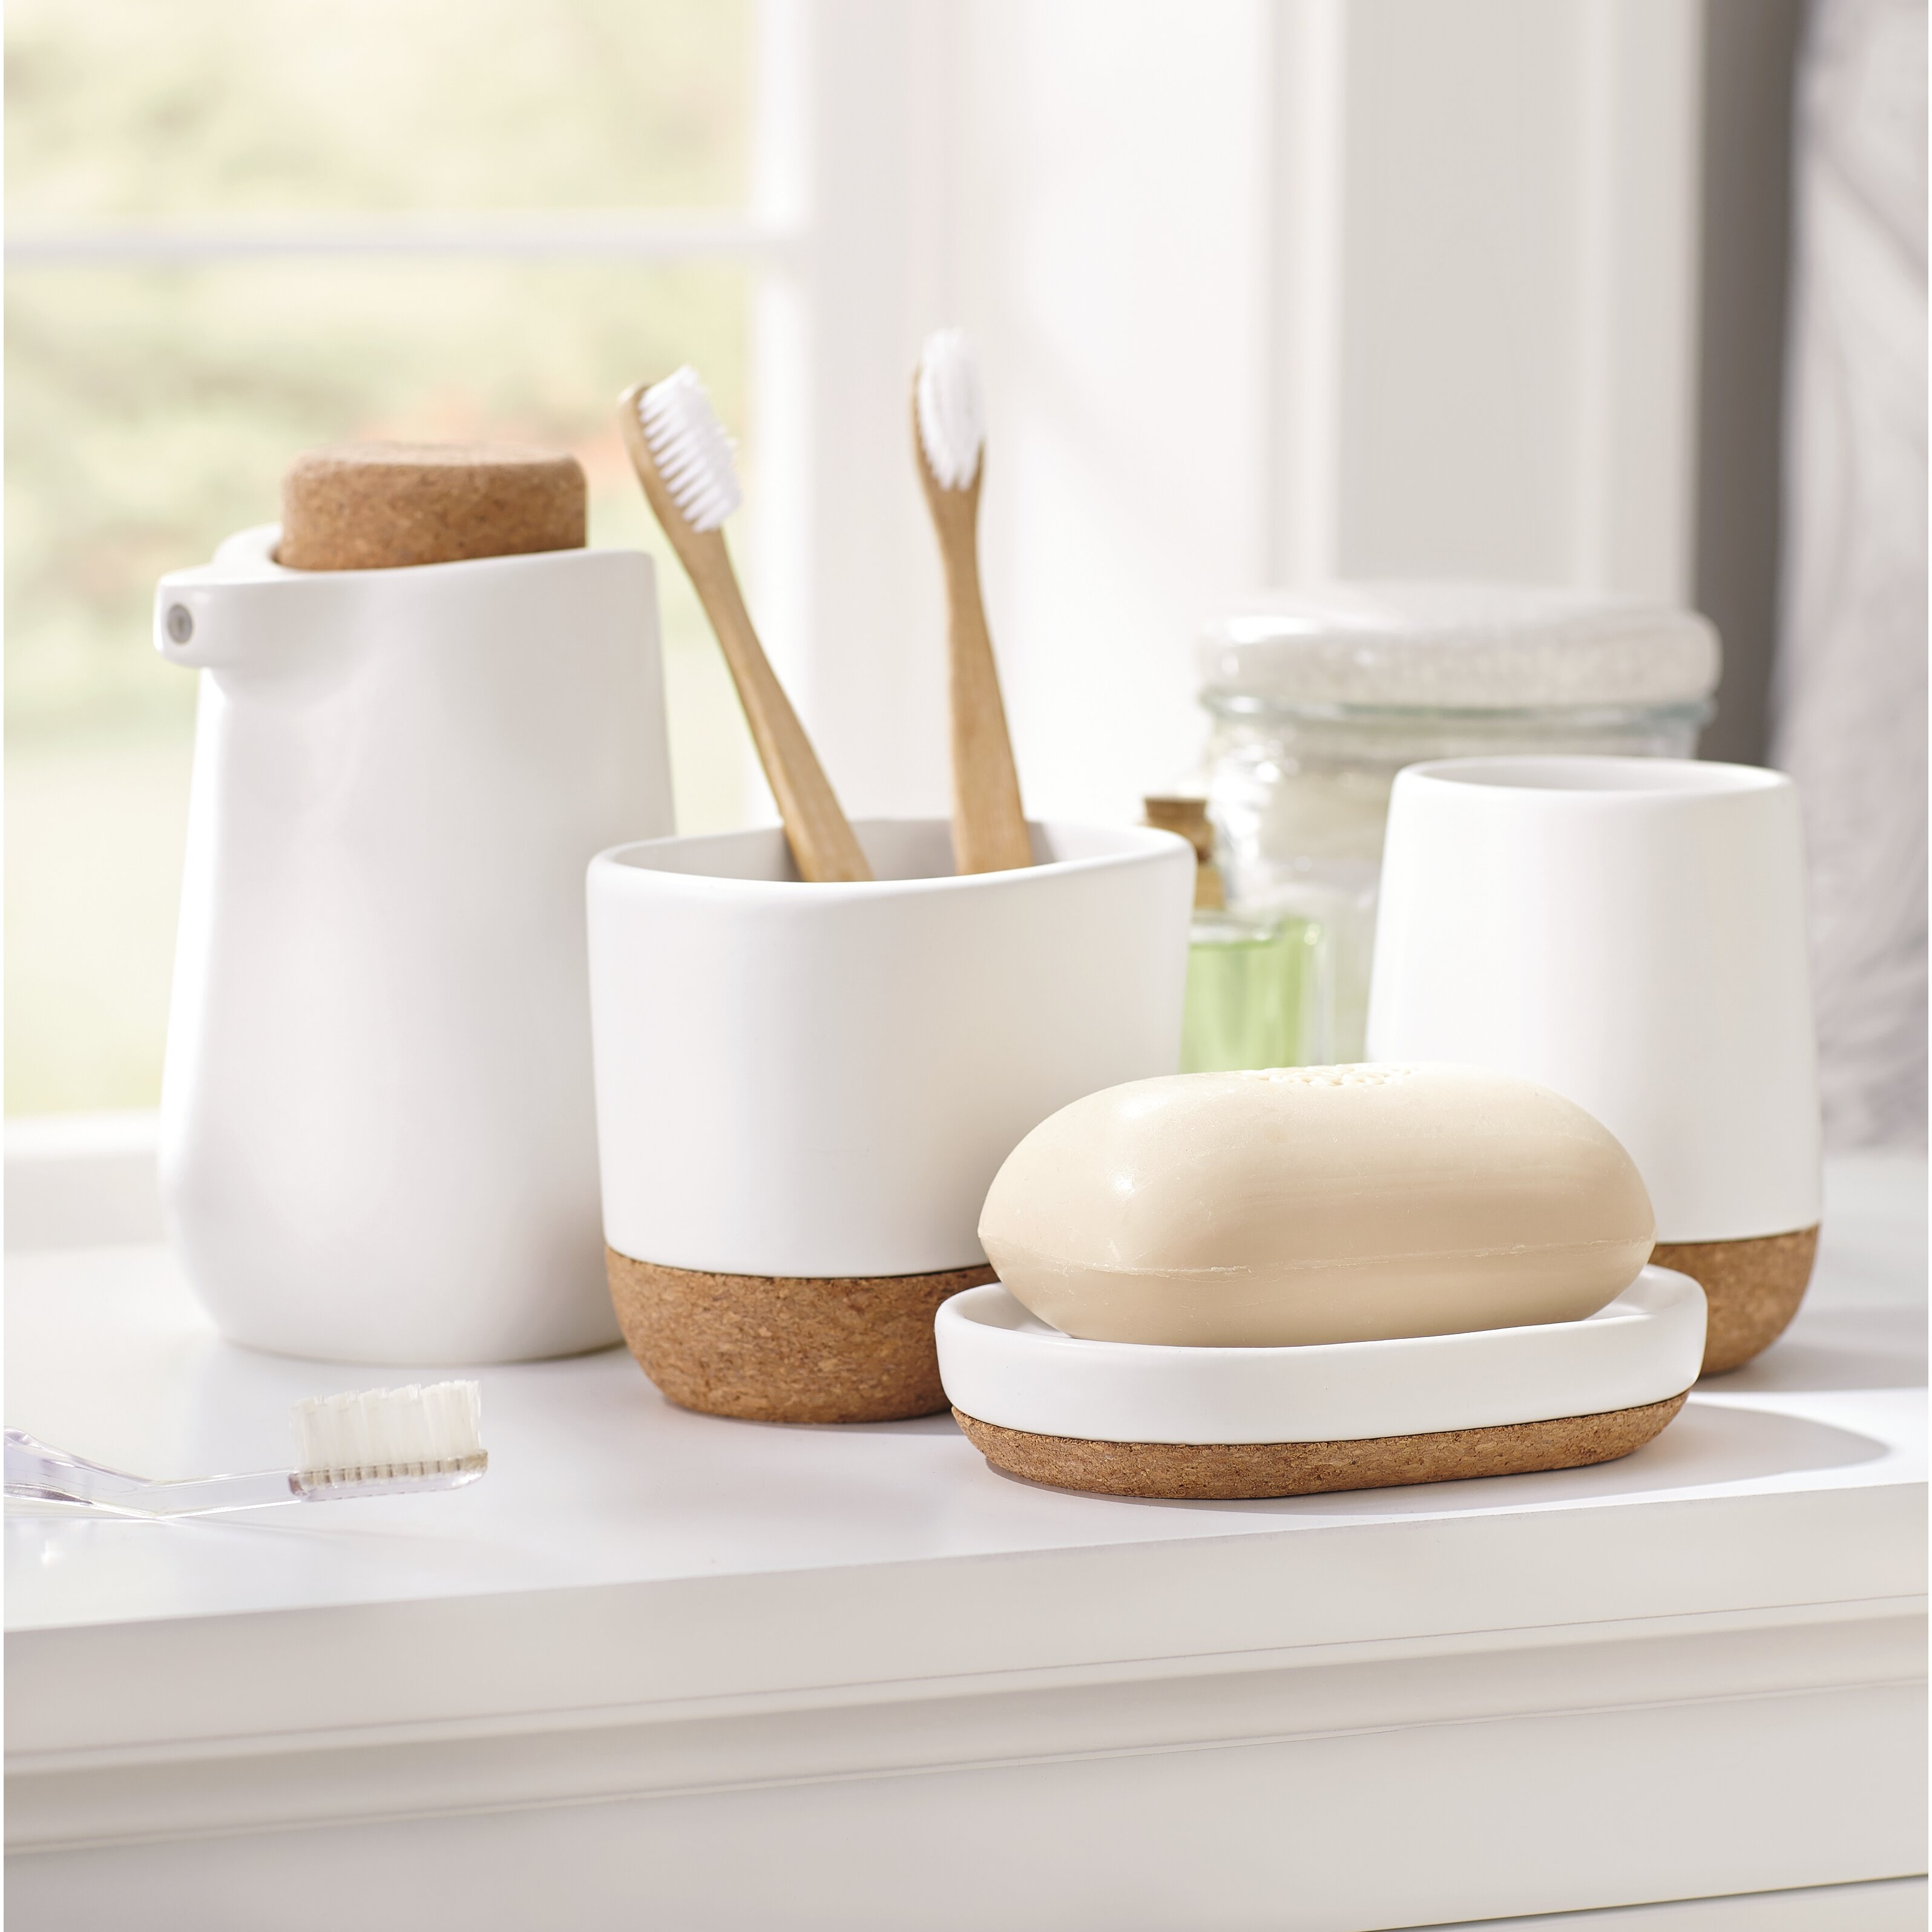 Bathroom soap dish